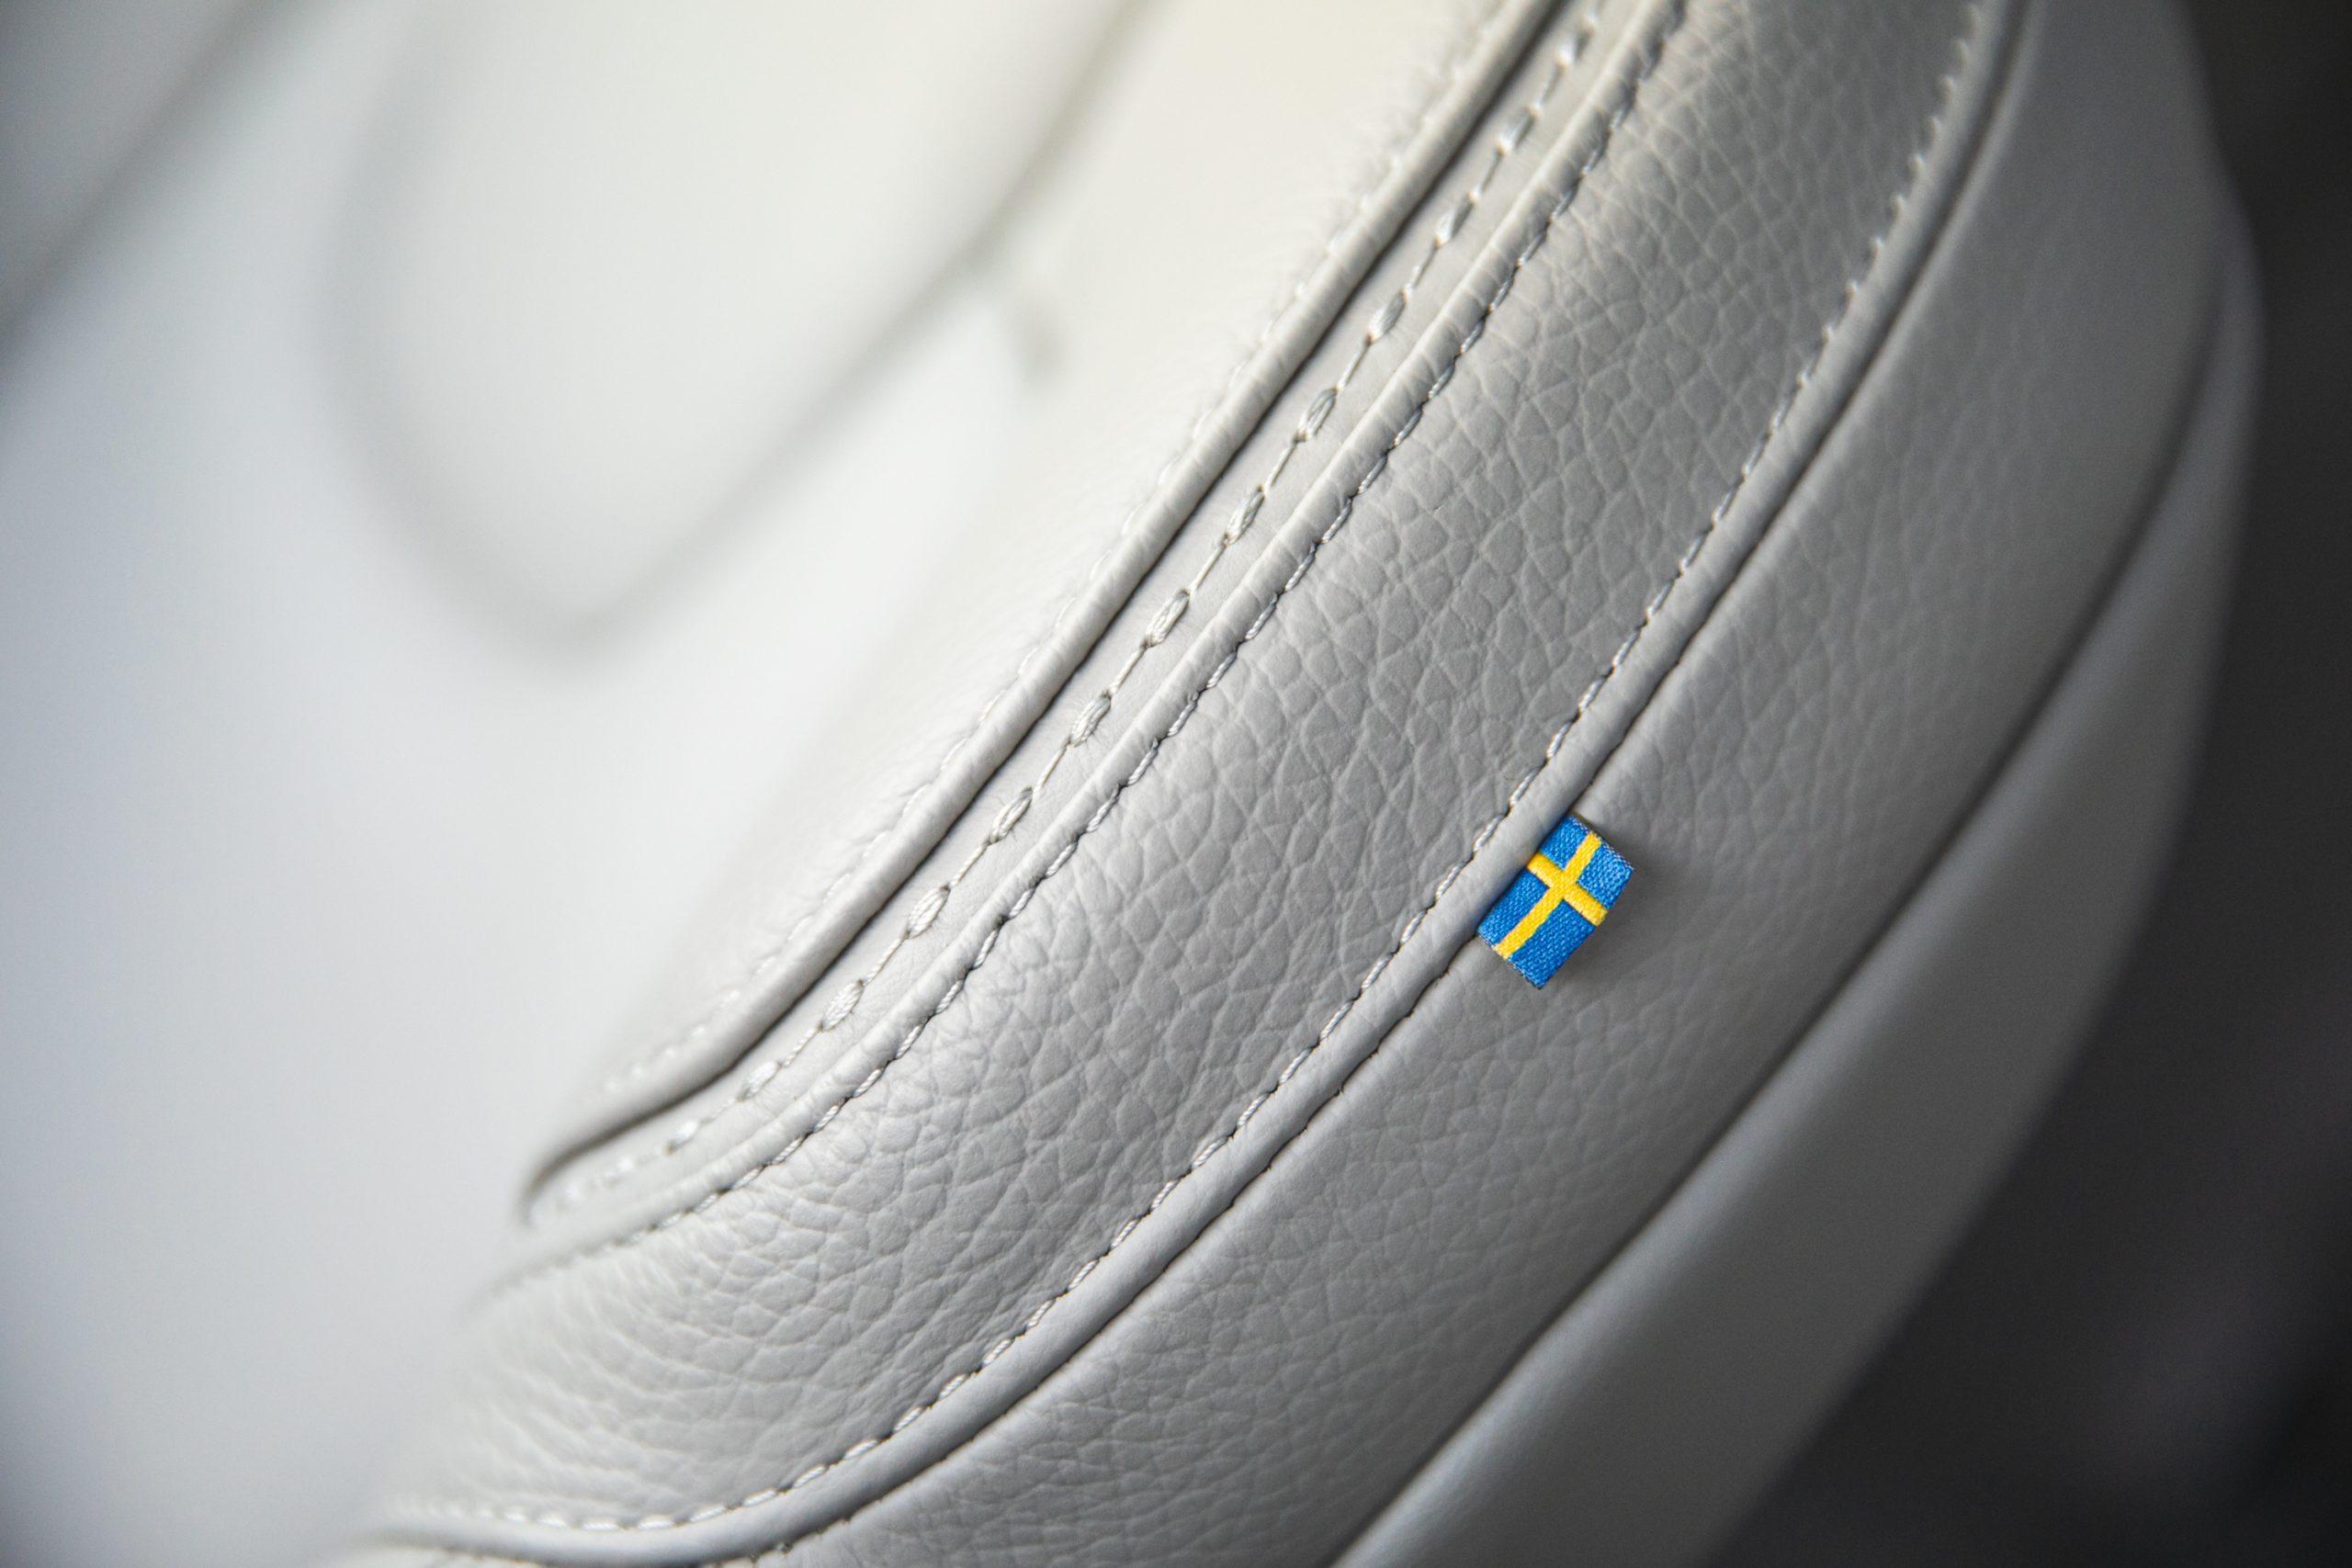 Volvo V60 Cross Country T5 AWD seat swedish flag detail